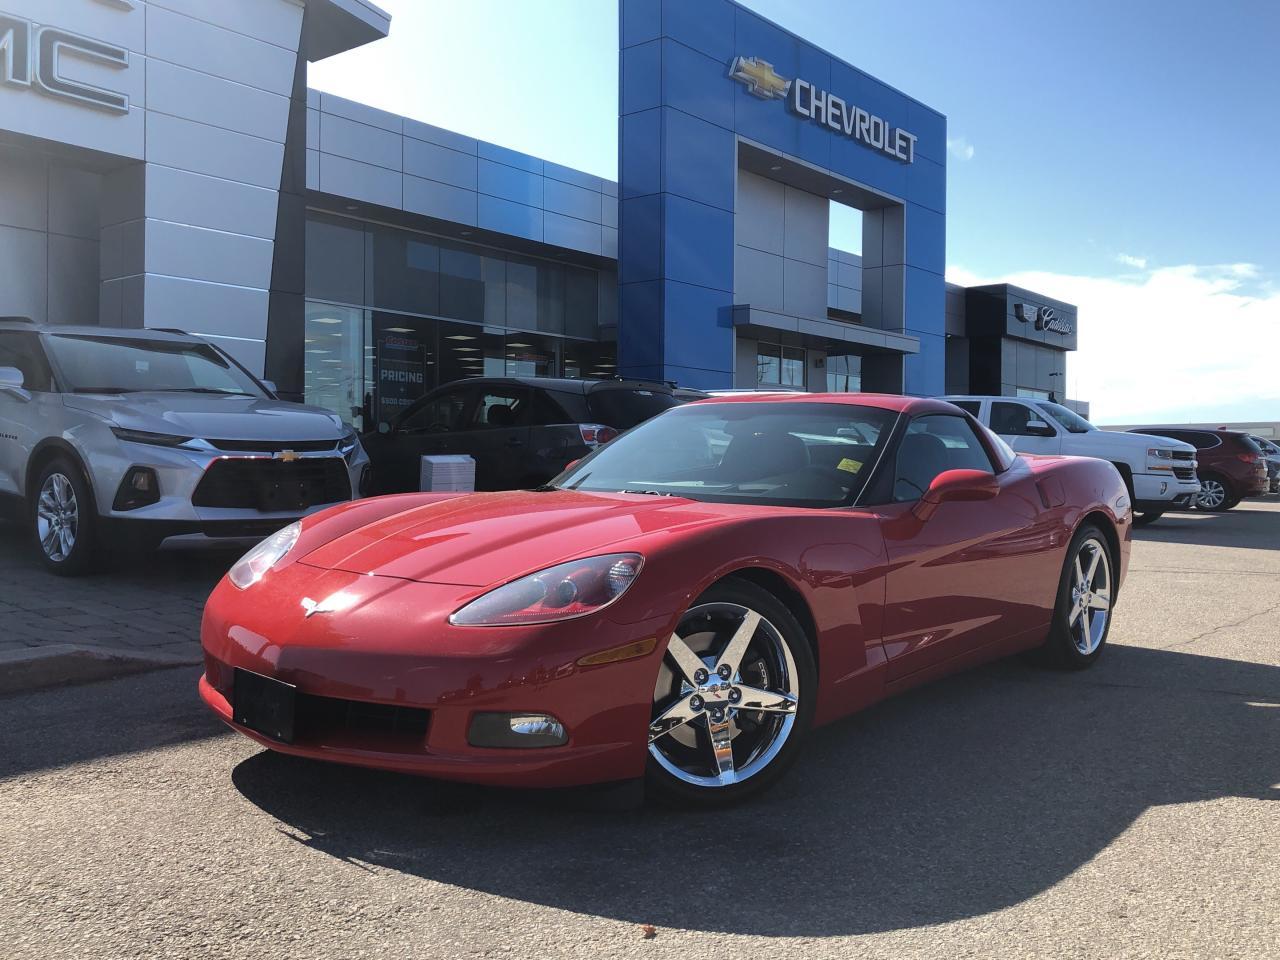 2005 Corvette For Sale >> Used 2005 Chevrolet Corvette 2dr Cpe For Sale In Barrie